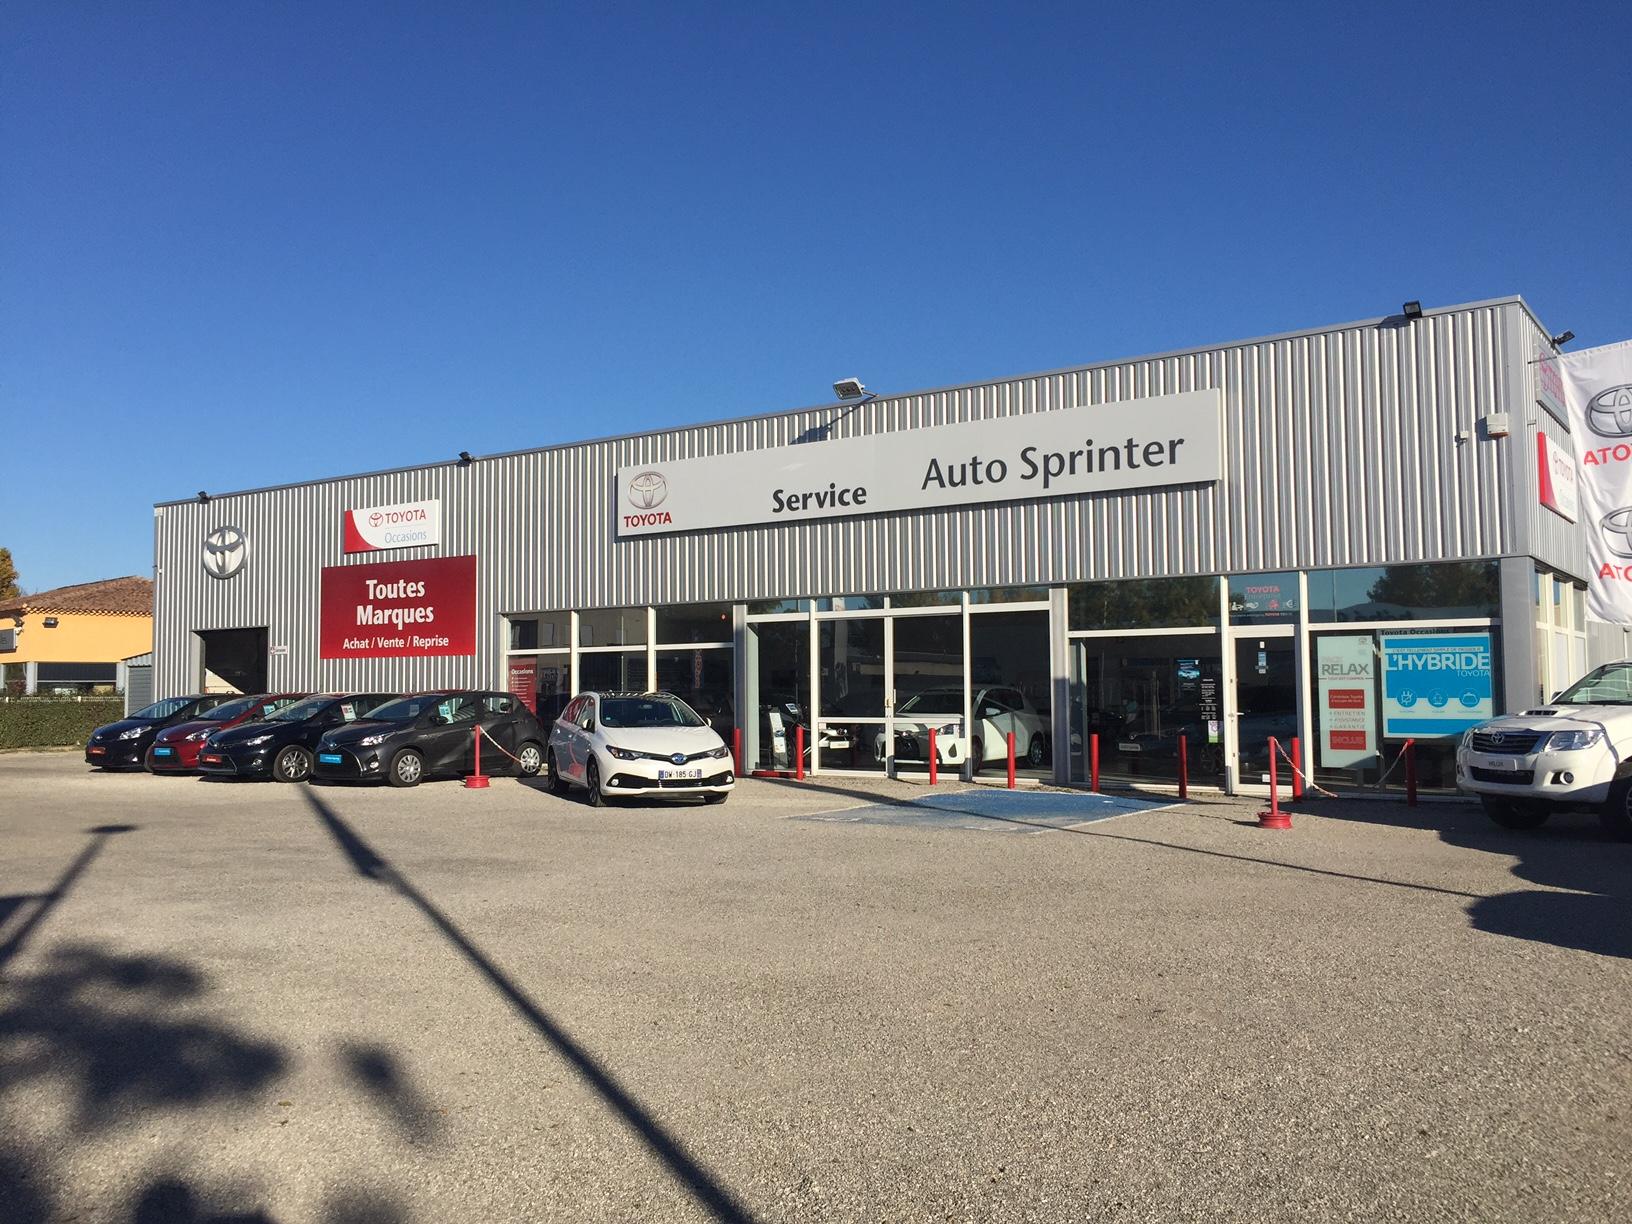 Toyota autosprinter pertuis concessionnaire toyota for Garage pertuis occasion